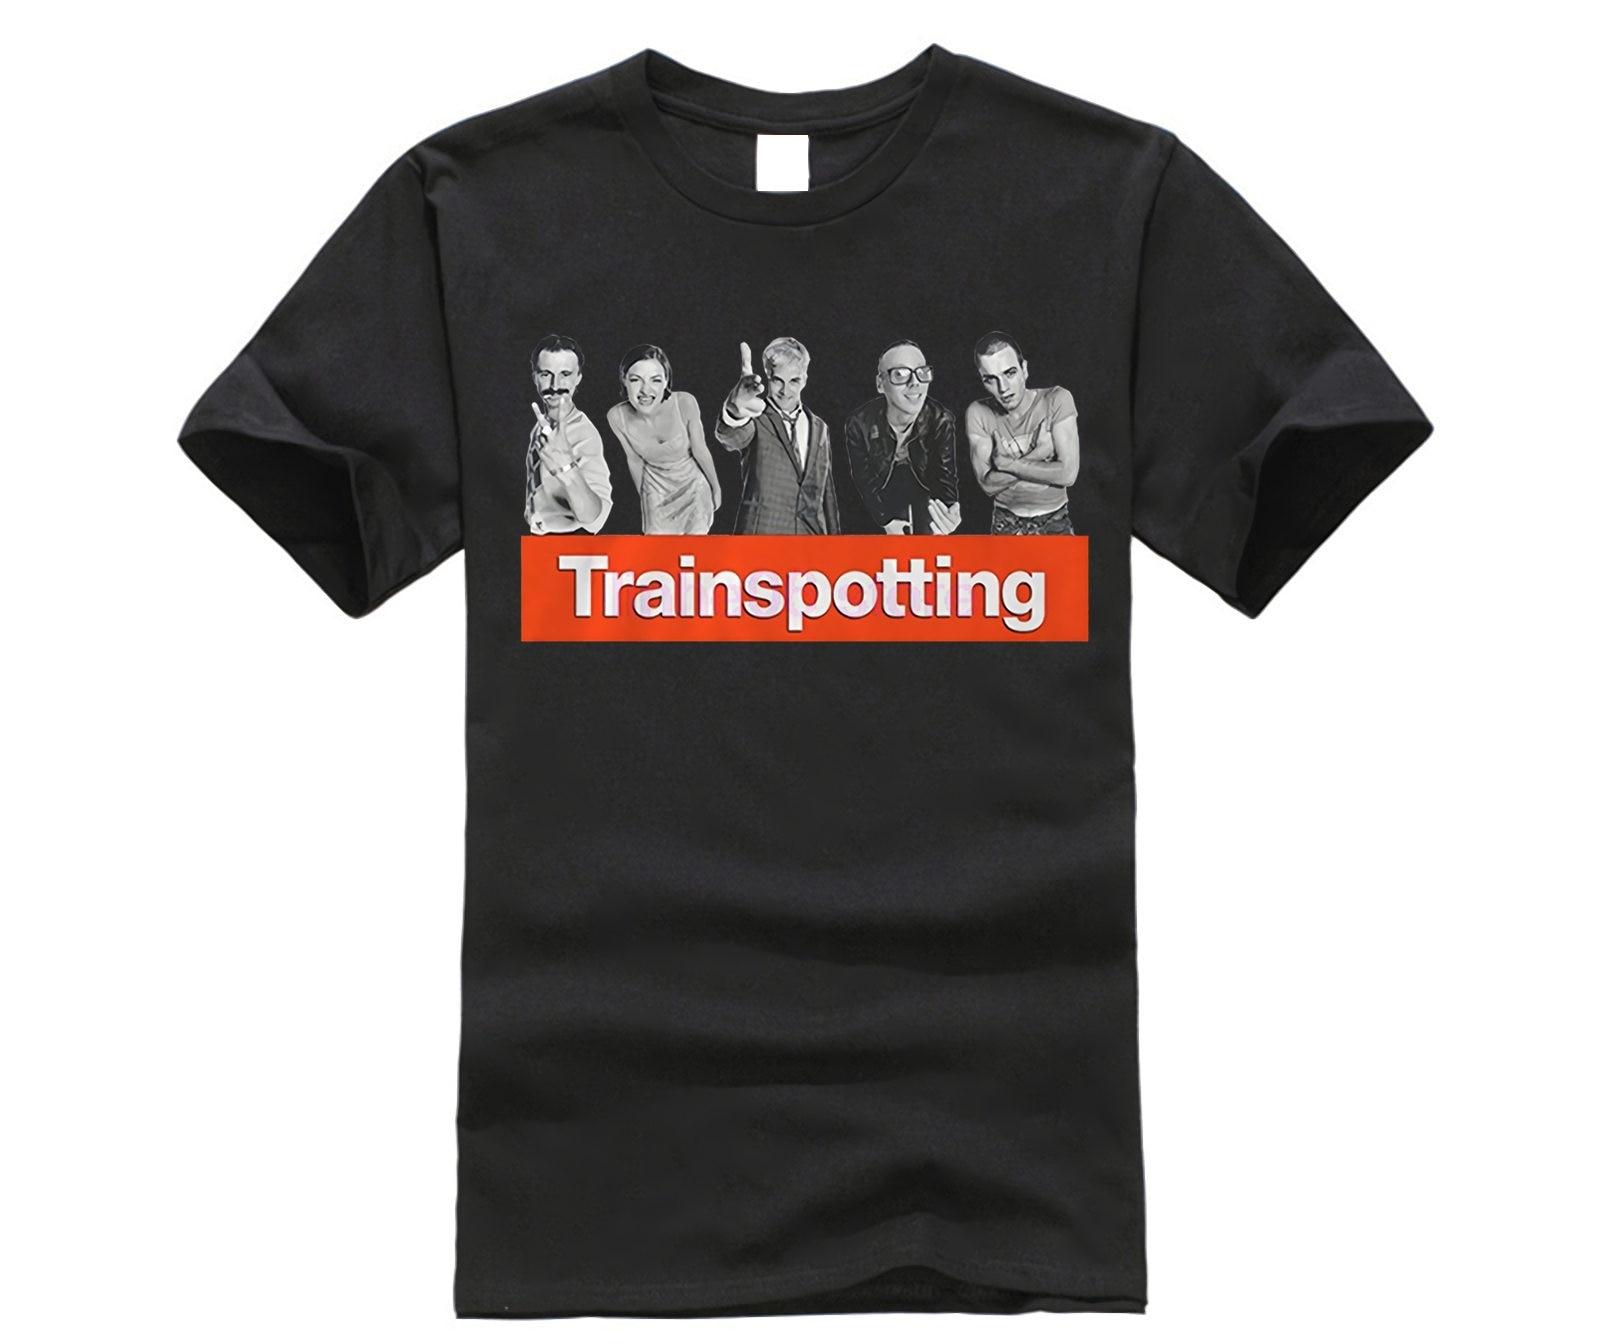 Fashion T Shirts Trainspotting Vintage Movie T Shirts Family Brand Short Sleeve Boyfriend's T Shirts